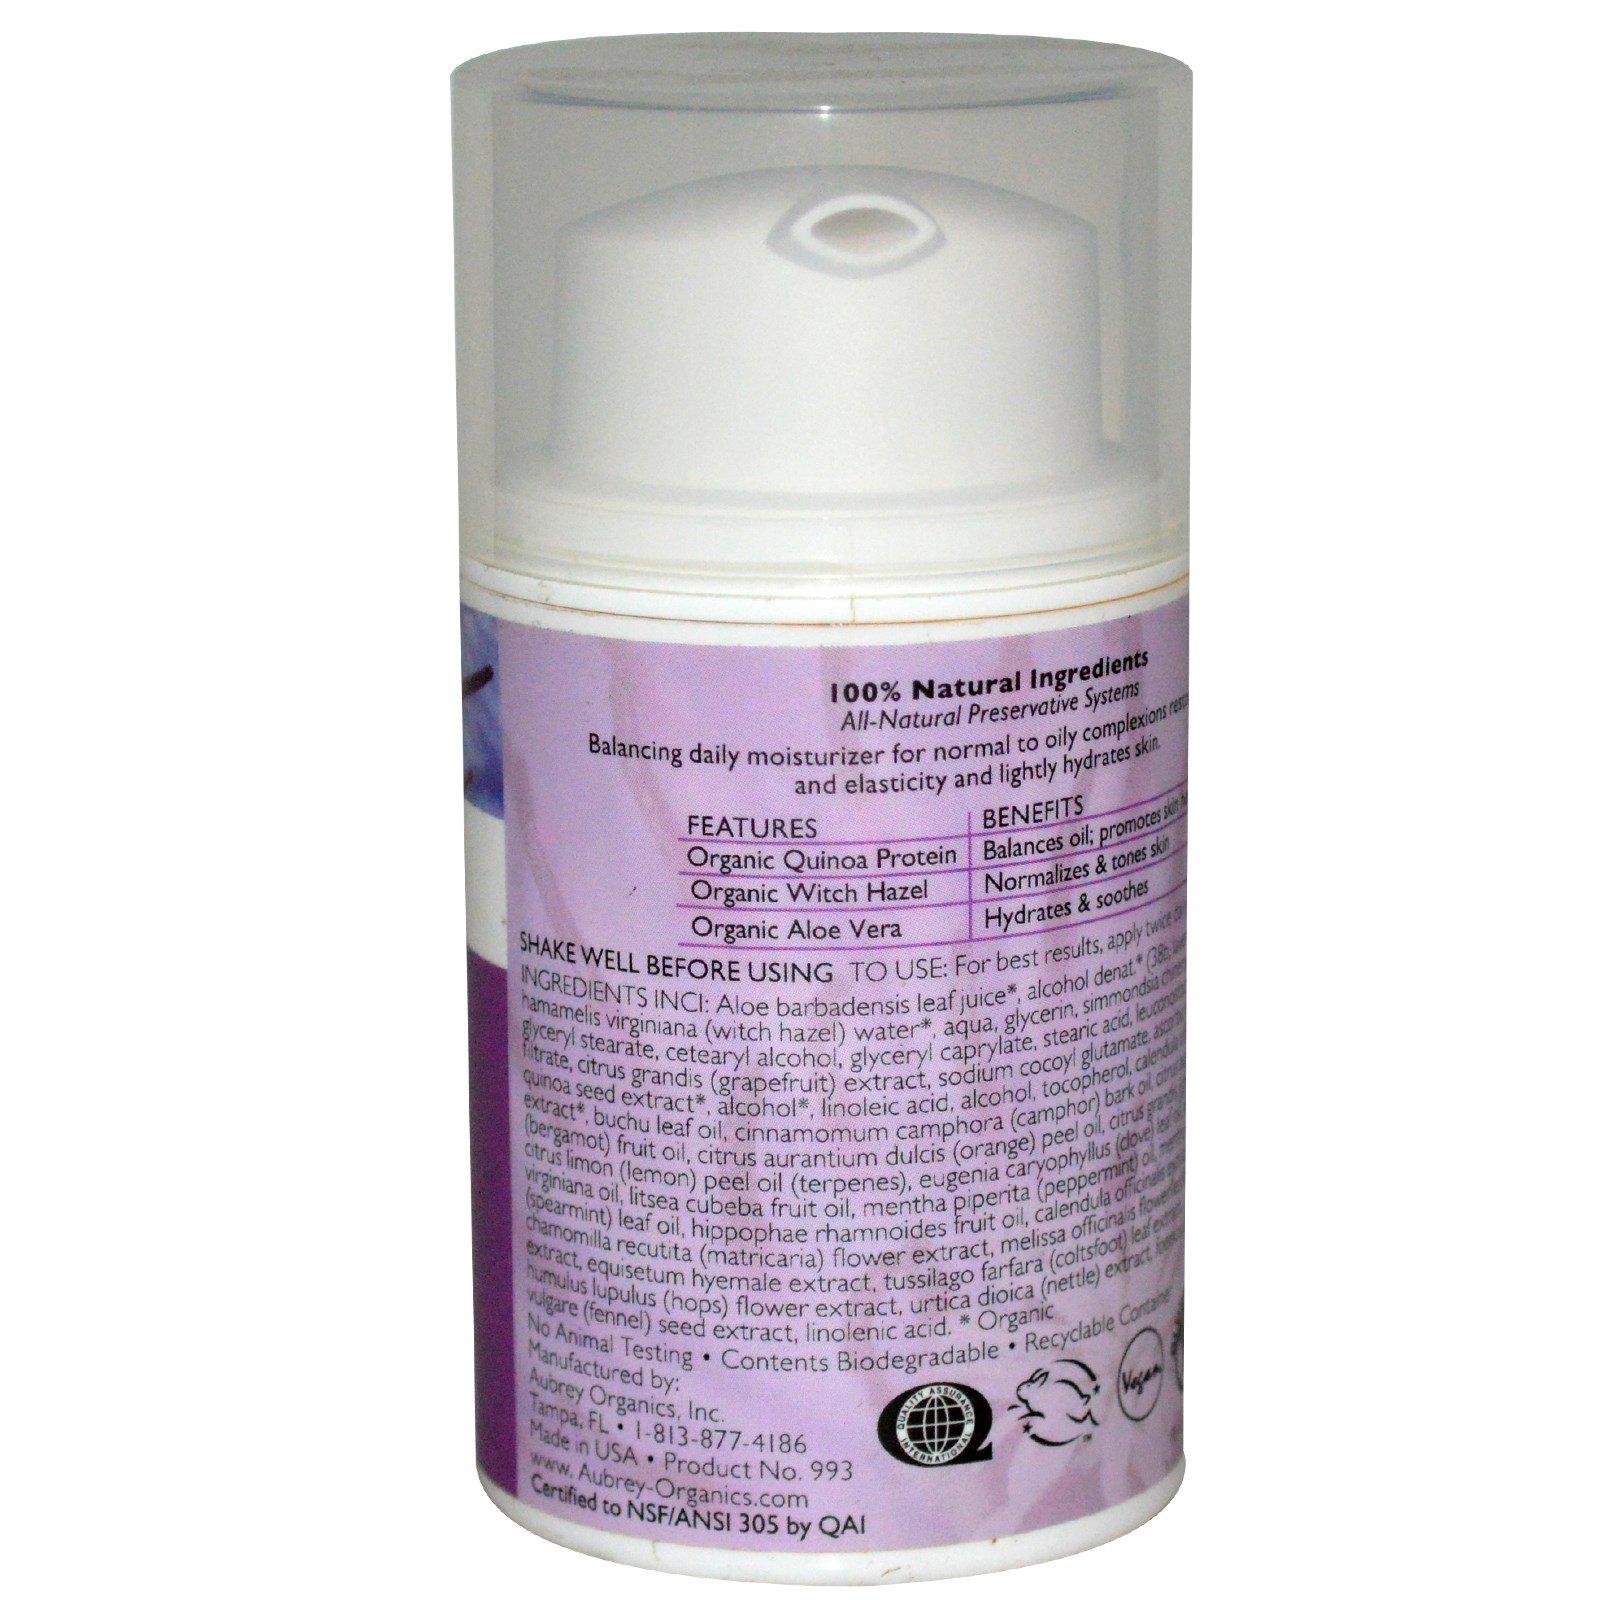 Aubrey Organics - EveryDay Basics Moisturizer, Normal/Dry Skin, 1.7 fl oz (50 ml) - 4 Packs Prescription Youth by Prescription Youth - Intensive Eye Cream--14g/.5oz